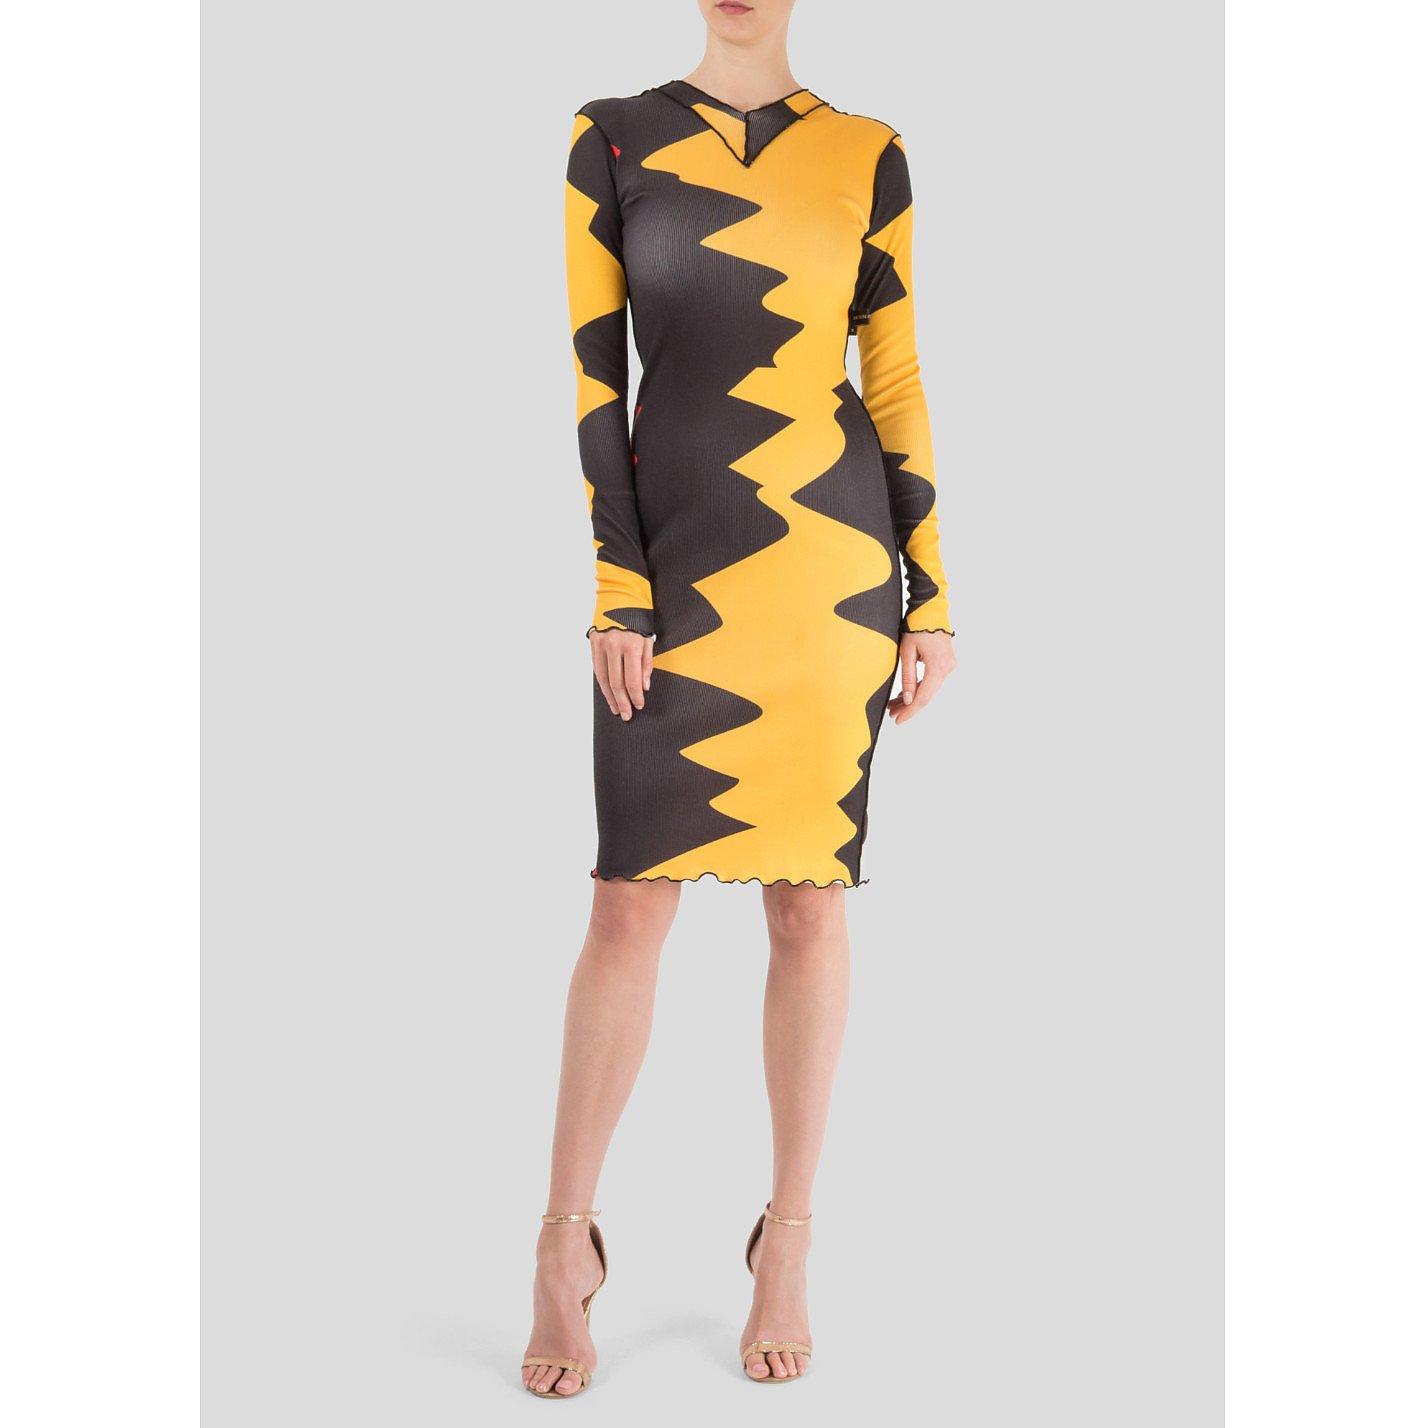 Minnanhui Multicolour Bodycon Dress